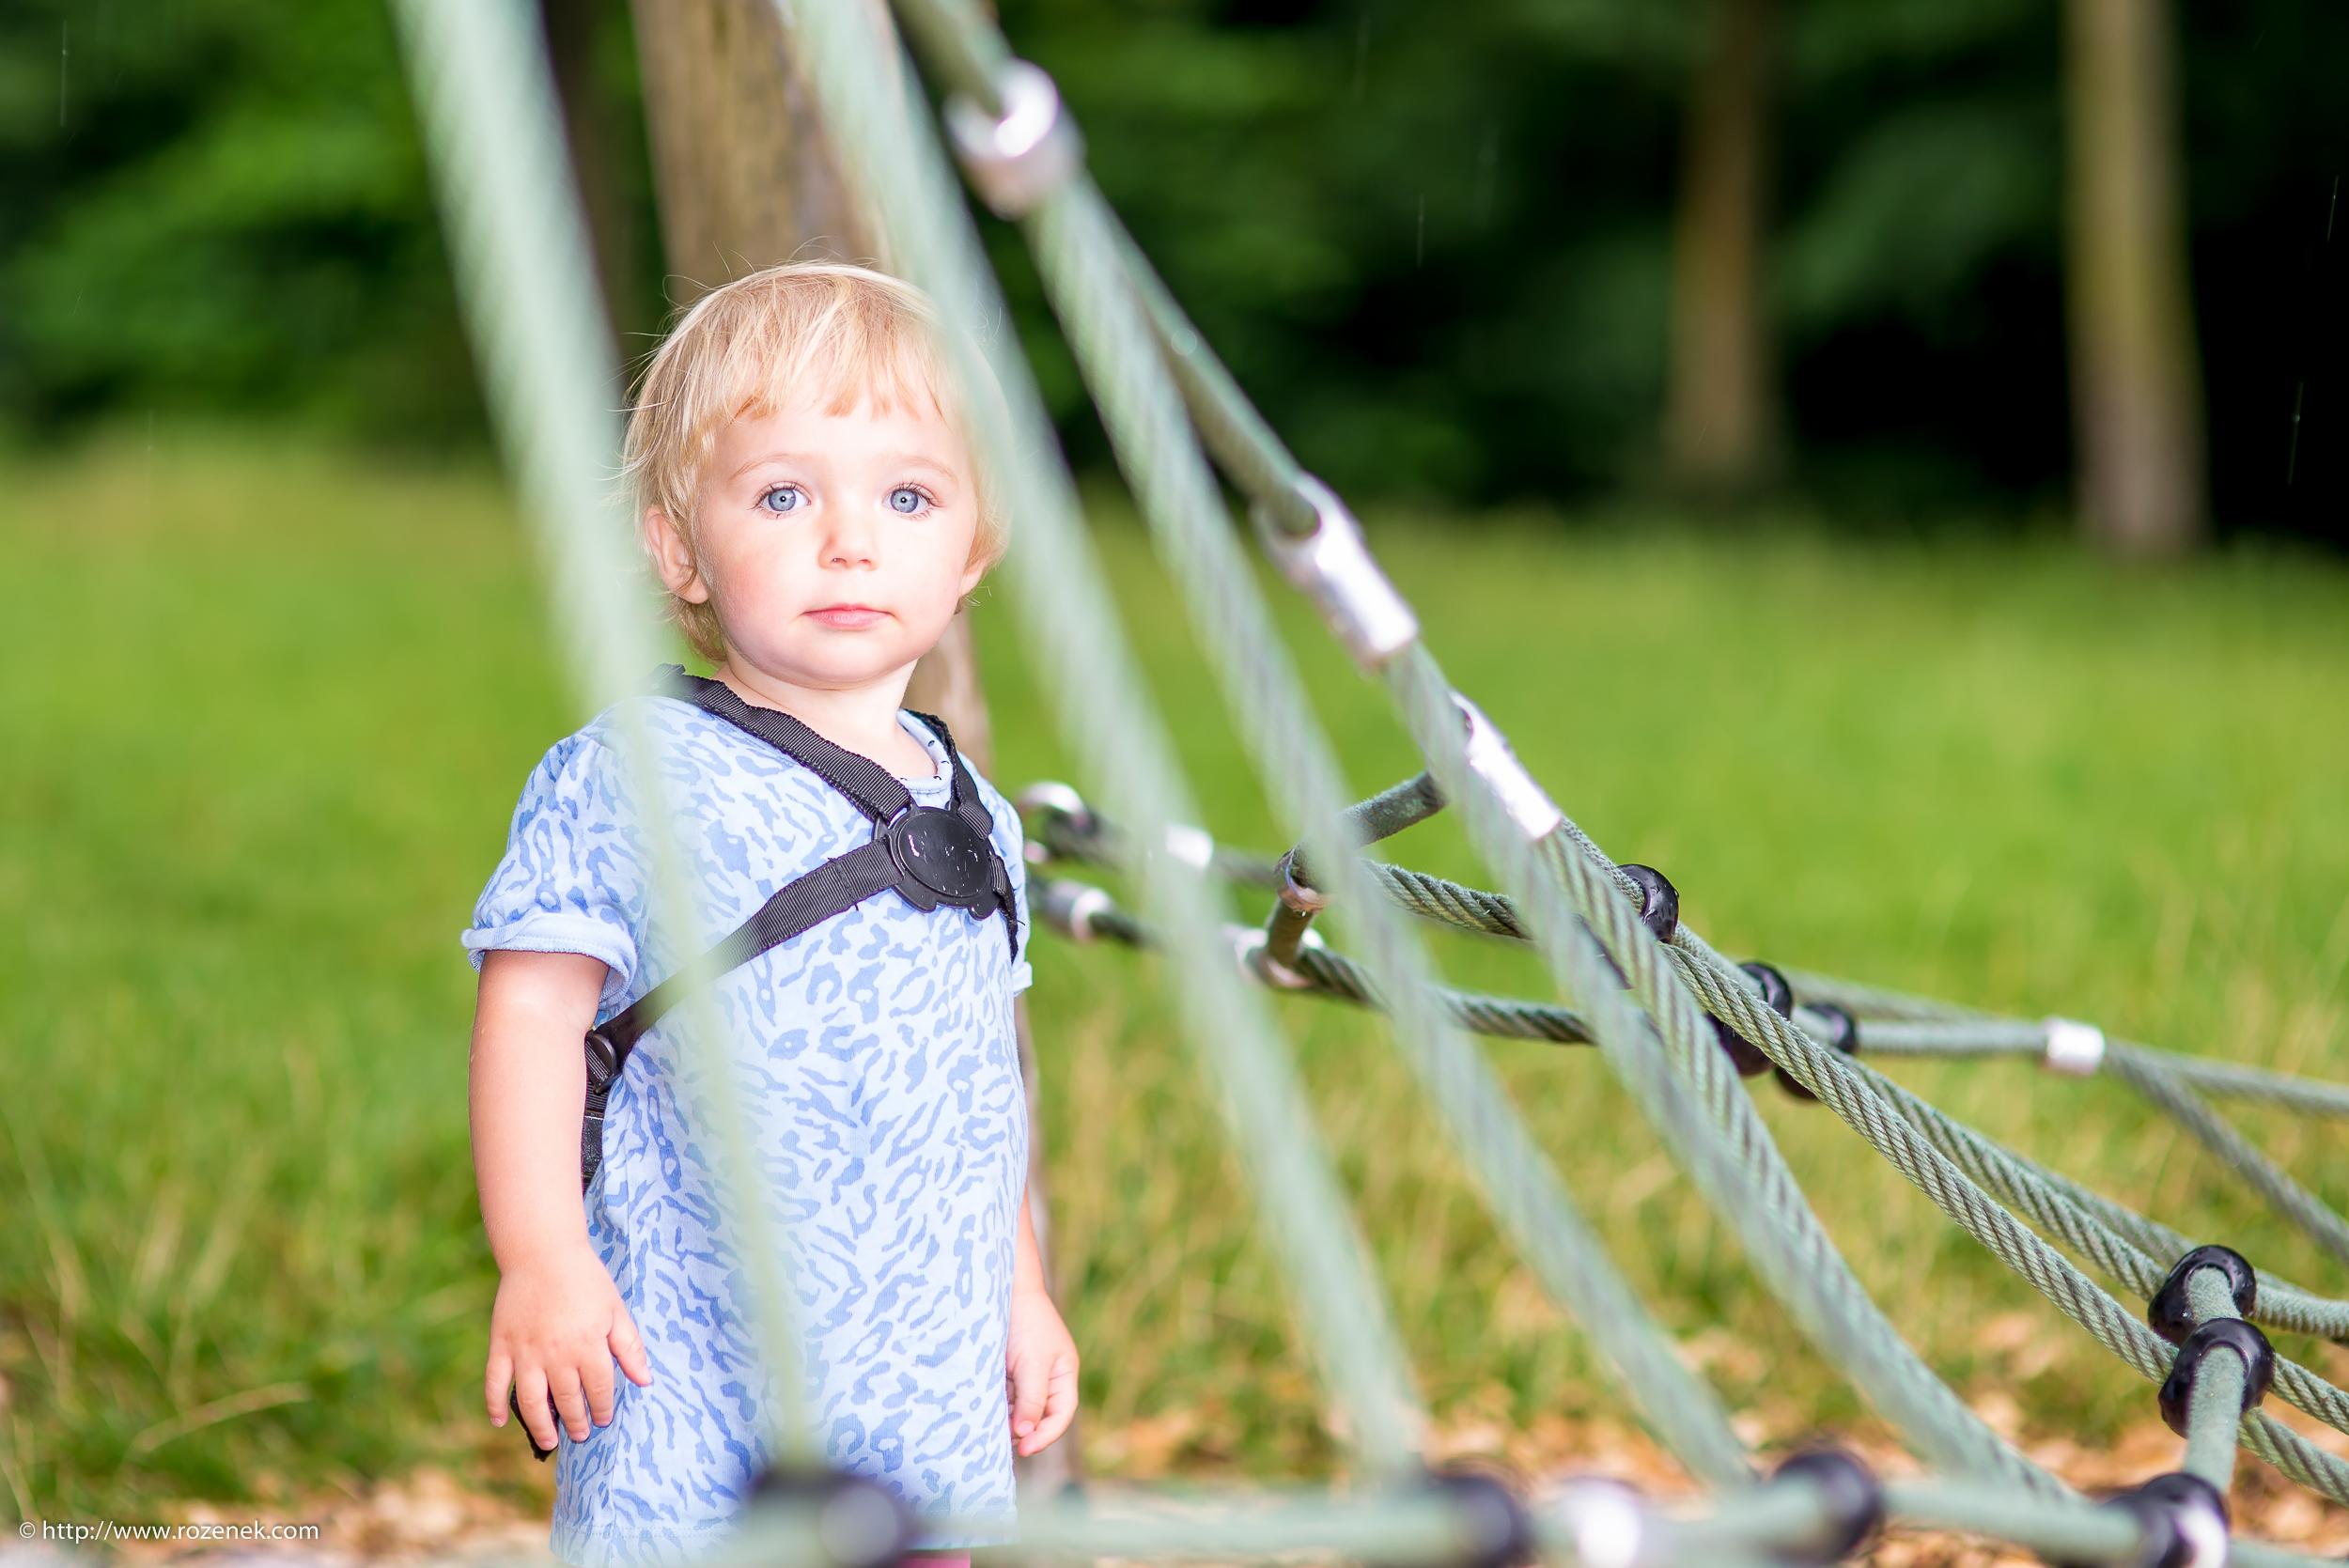 2016.08.05 - Karina at Queen Elizabeth Country Park - 02